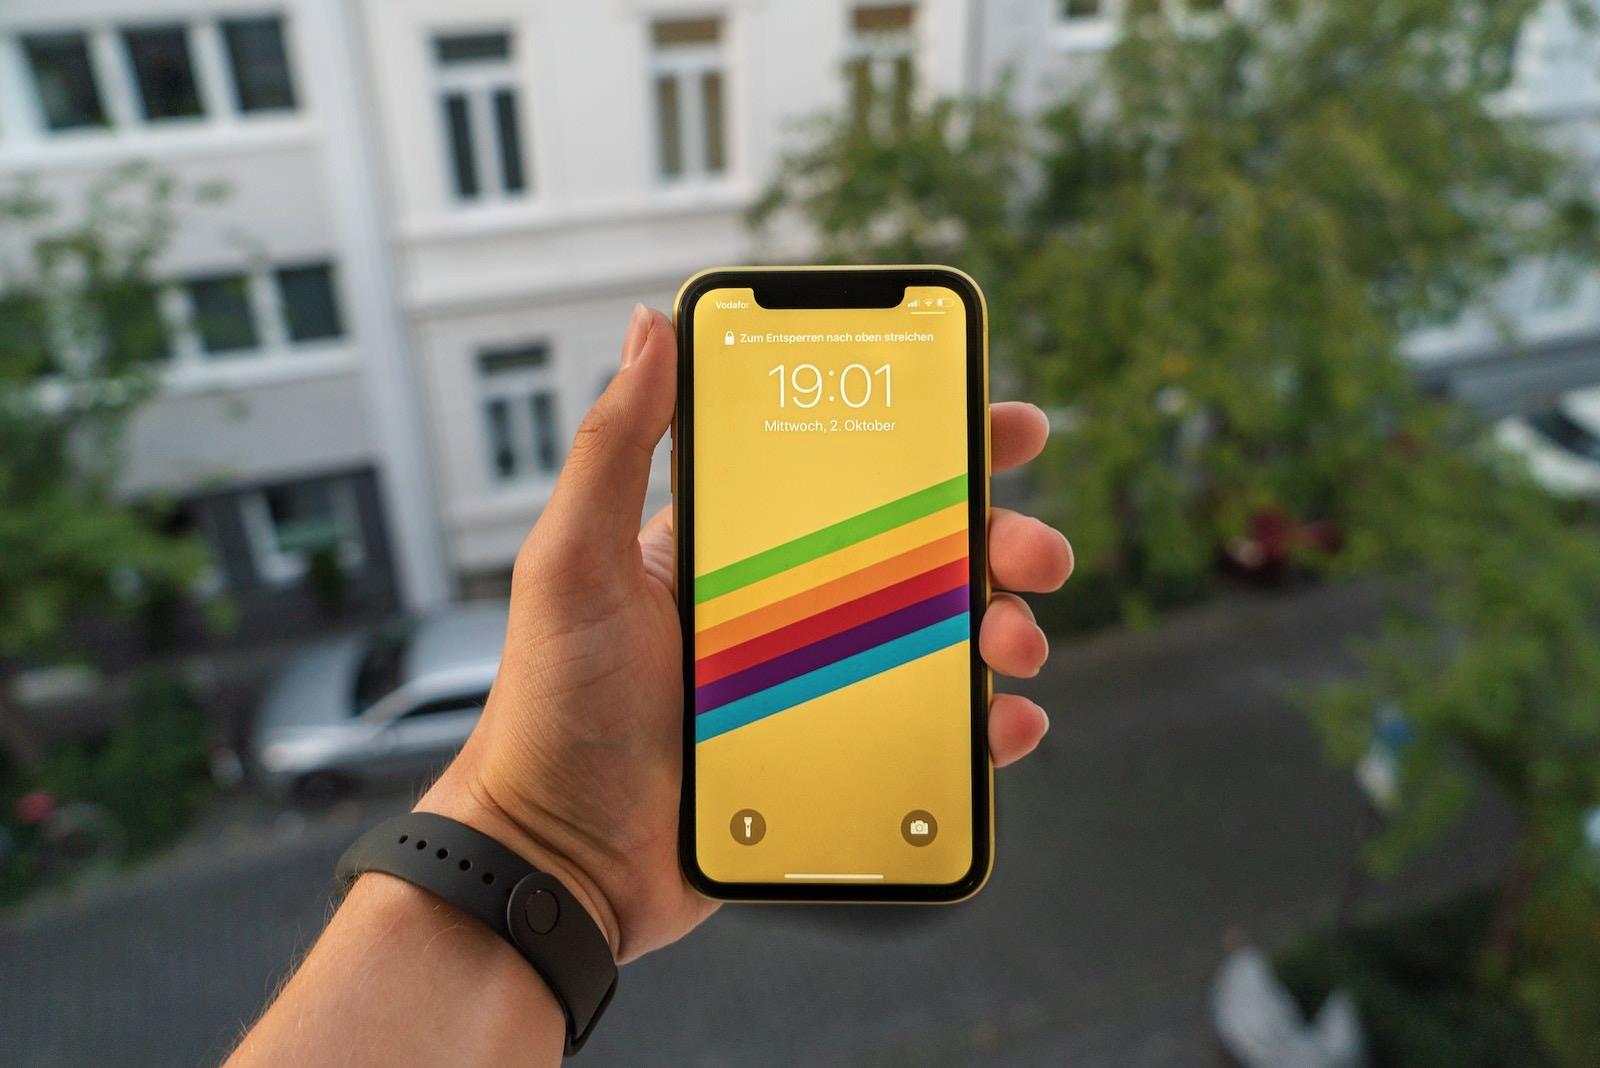 Mika baumeister wAfS5uEi3OA unsplash iphone 11 yellow